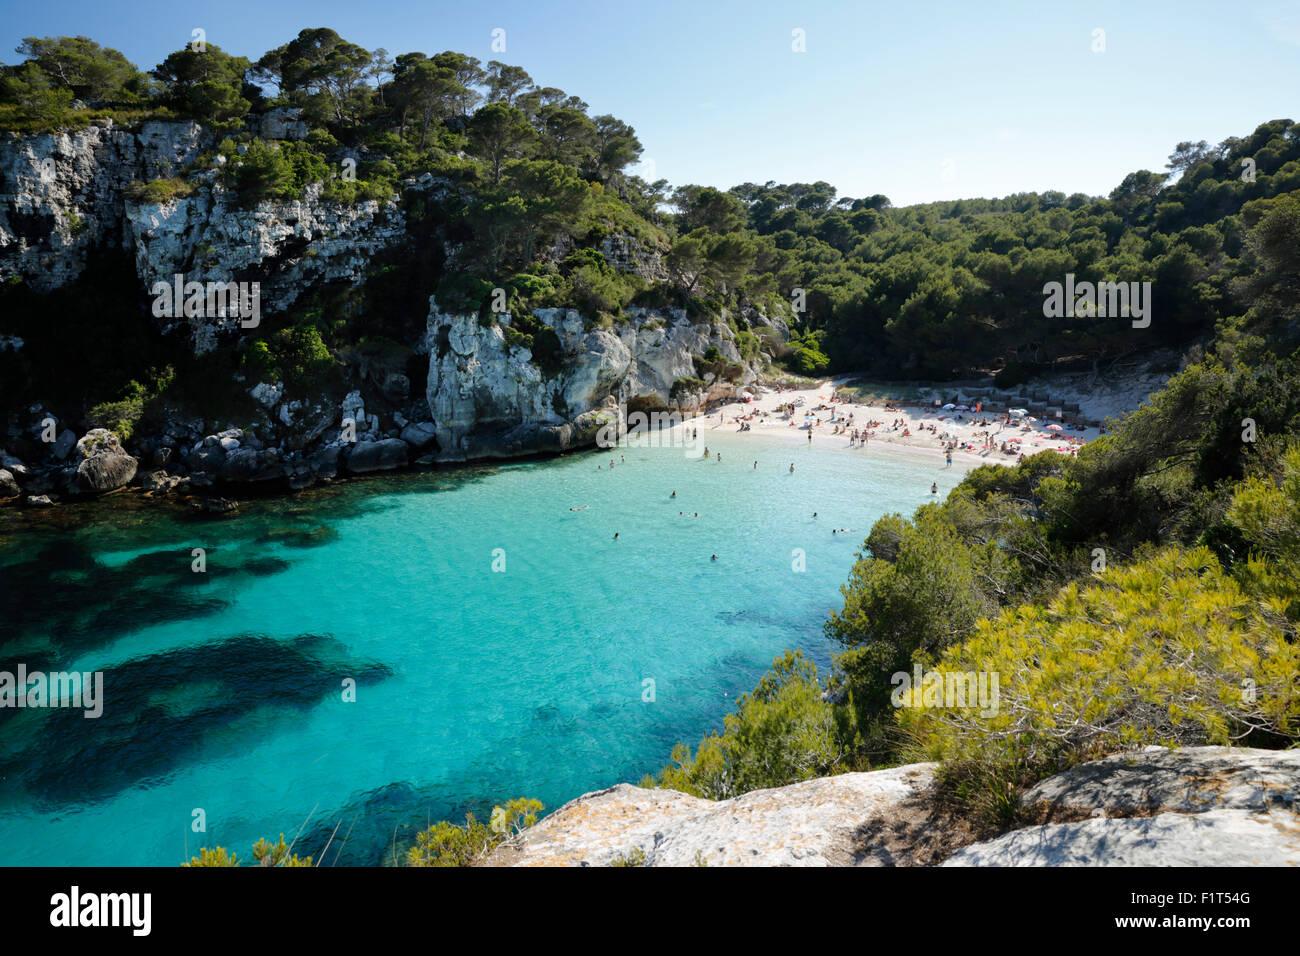 Cala Macarelleta, vicino a Cala Galdana, costa sud occidentale, Menorca, isole Baleari, Spagna, Mediterraneo, Europa Immagini Stock